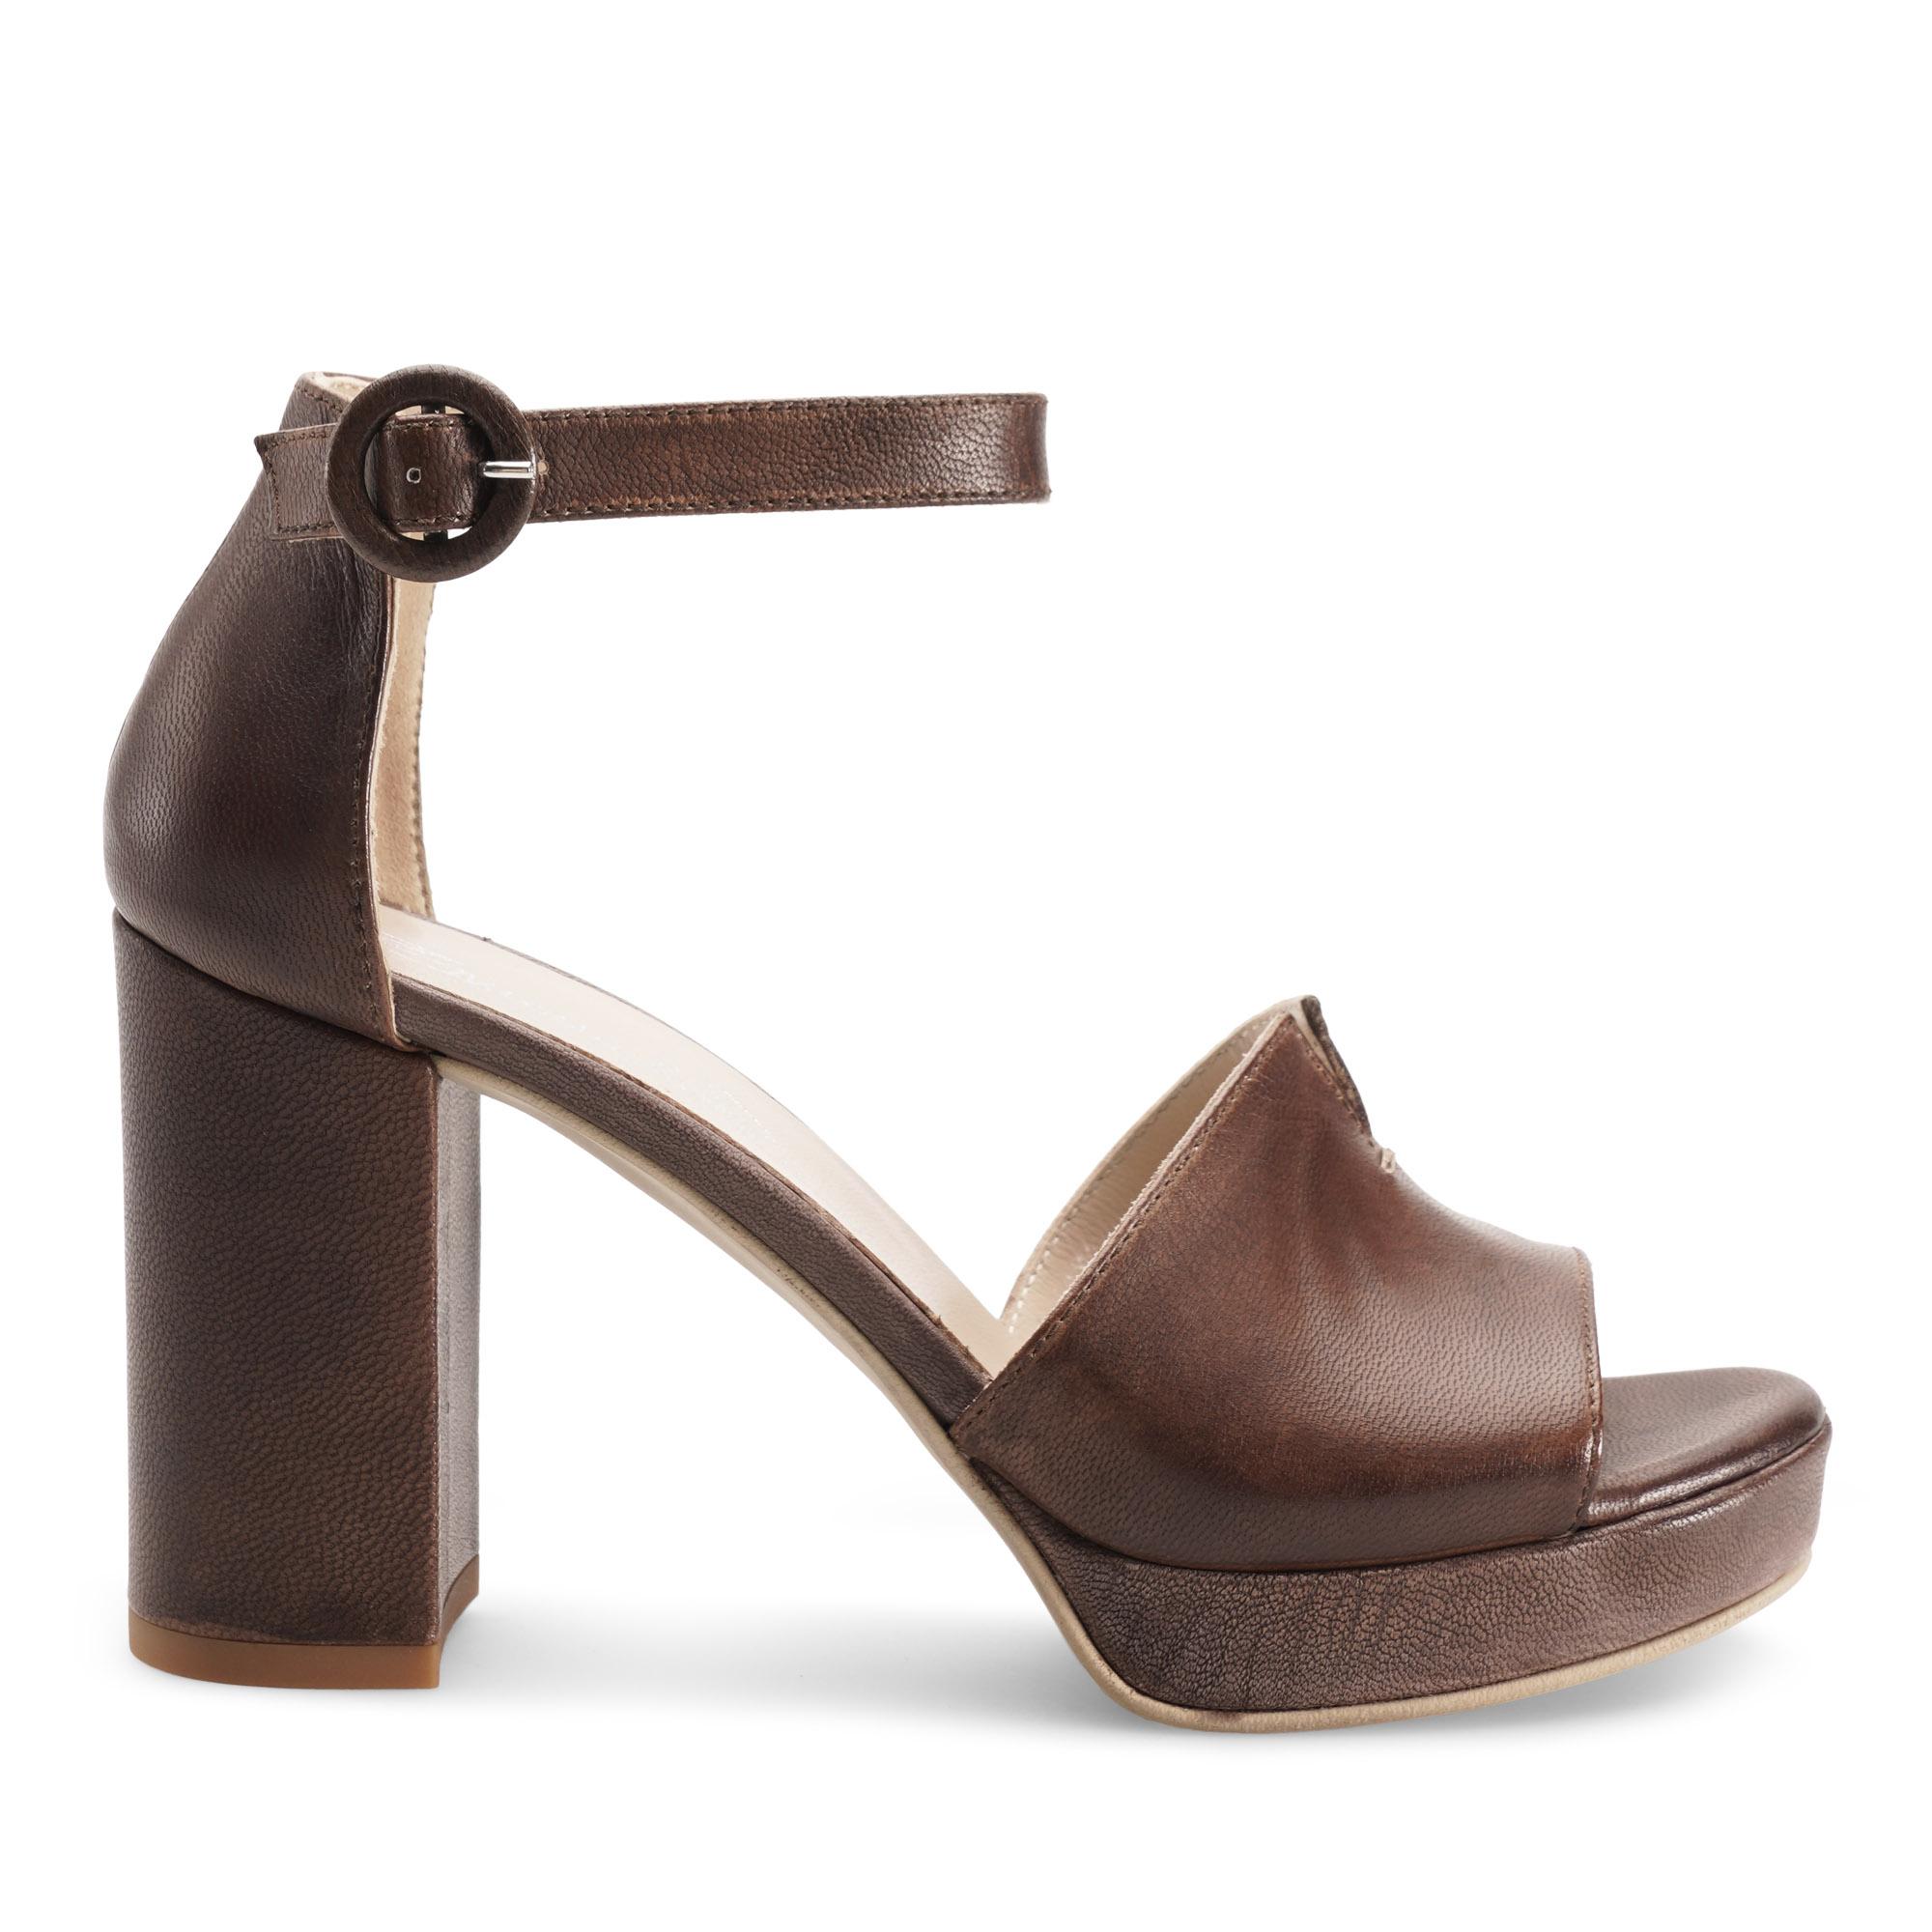 sansalo-donna-marrone-cuoio-plateau-tacchi-piantina-emanuela-passeri-heels-shoes-spring-summer-2021